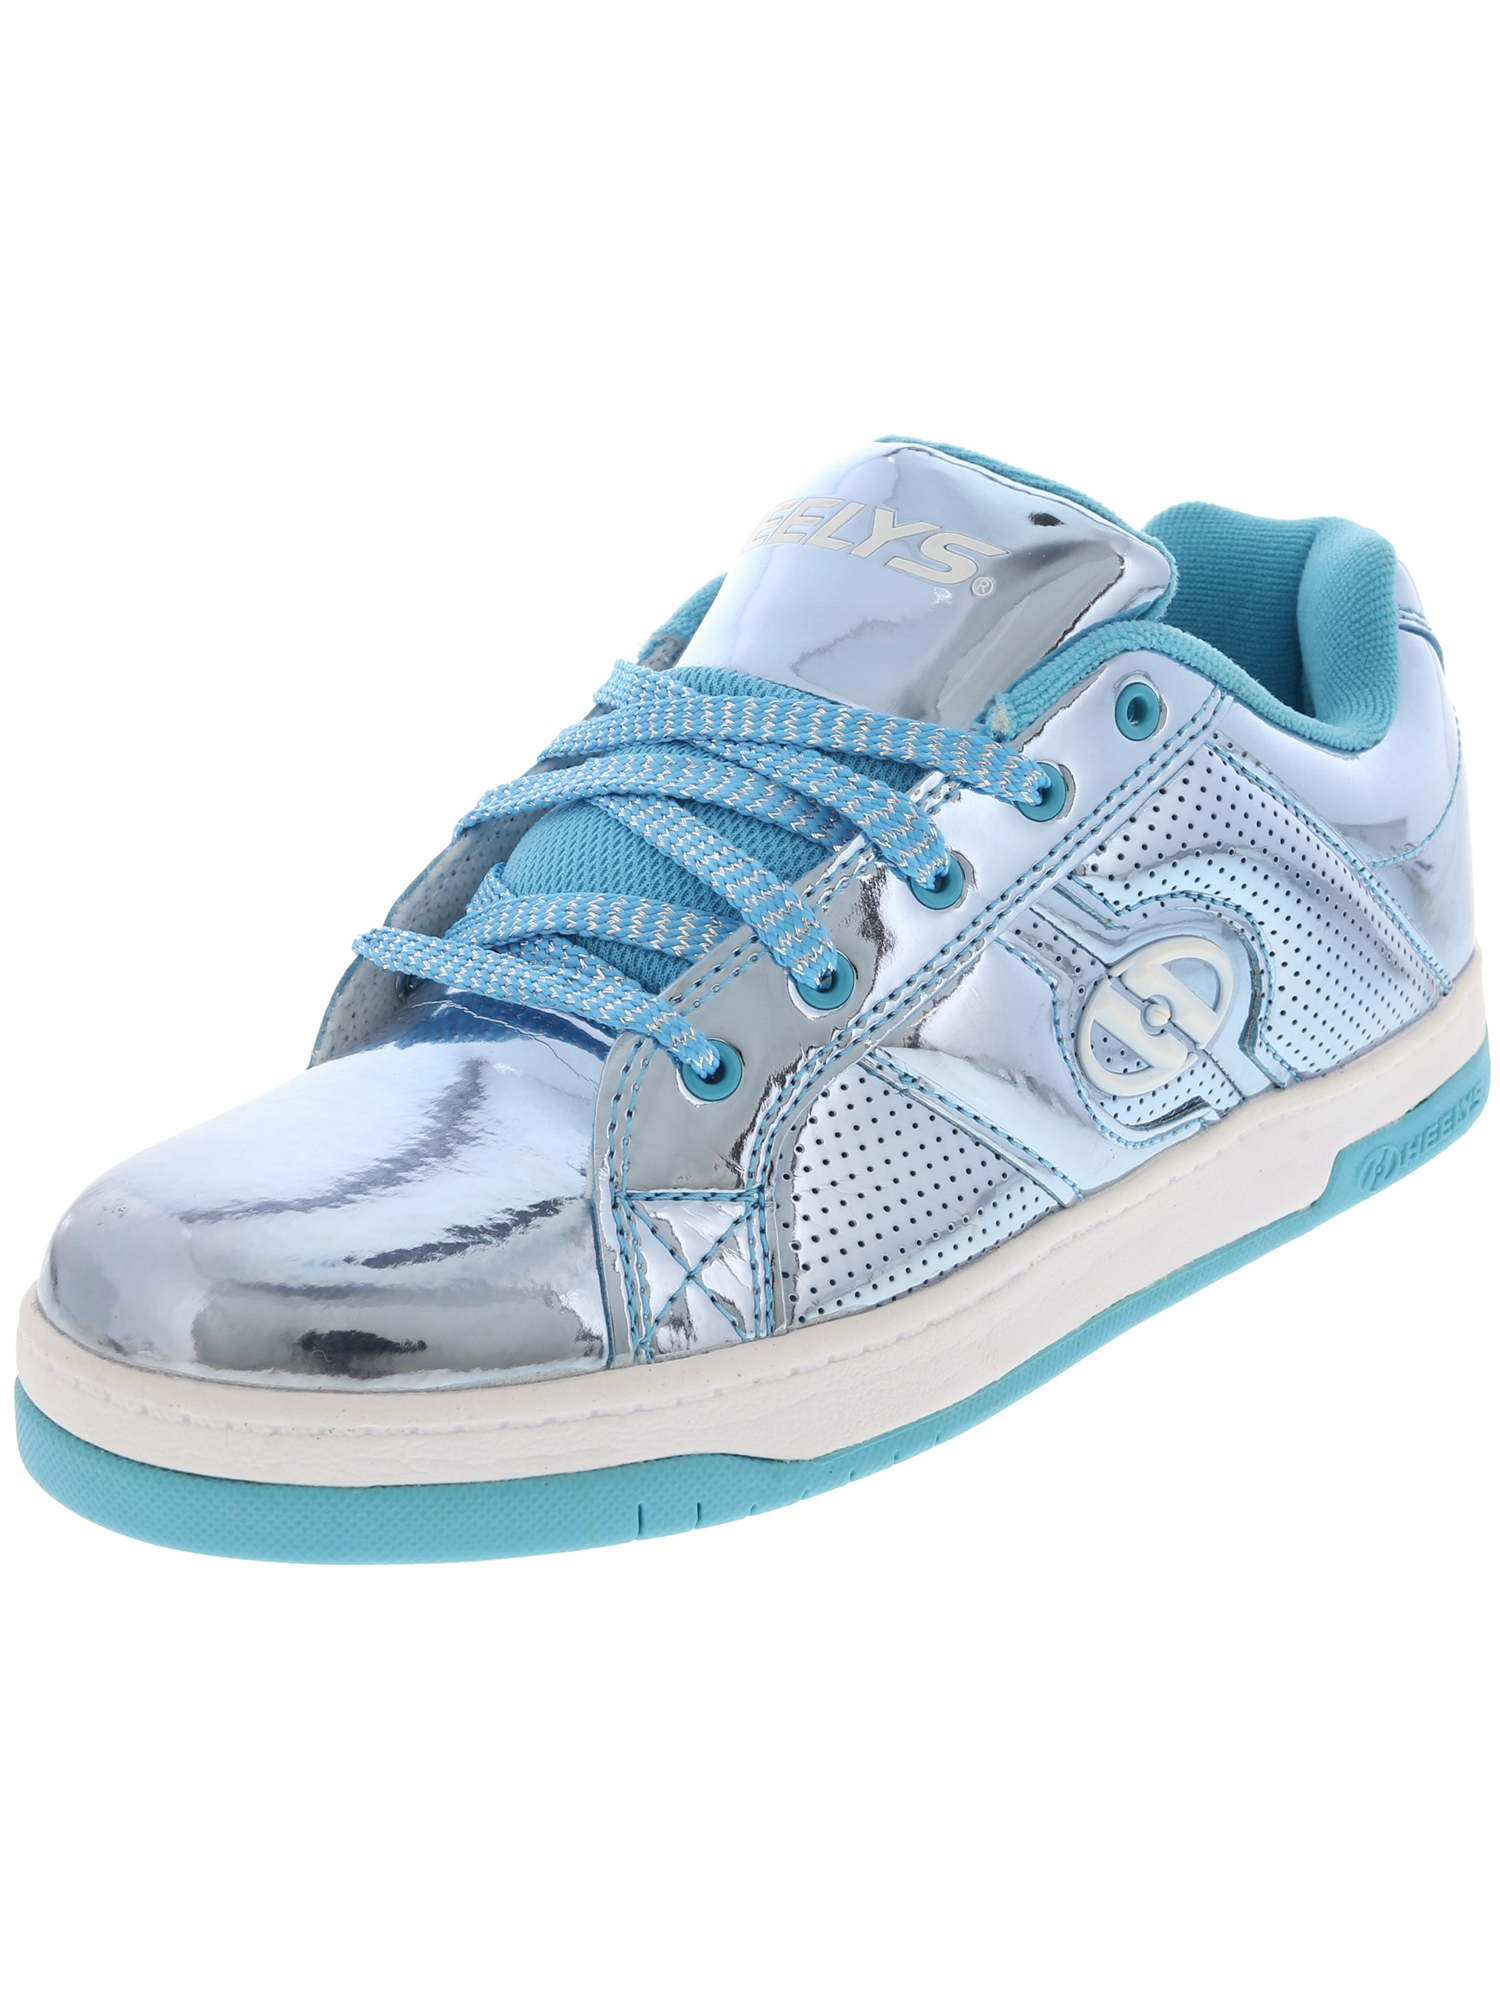 Heelys Split Chrome Blue Ankle-High Fashion Sneaker - 4M